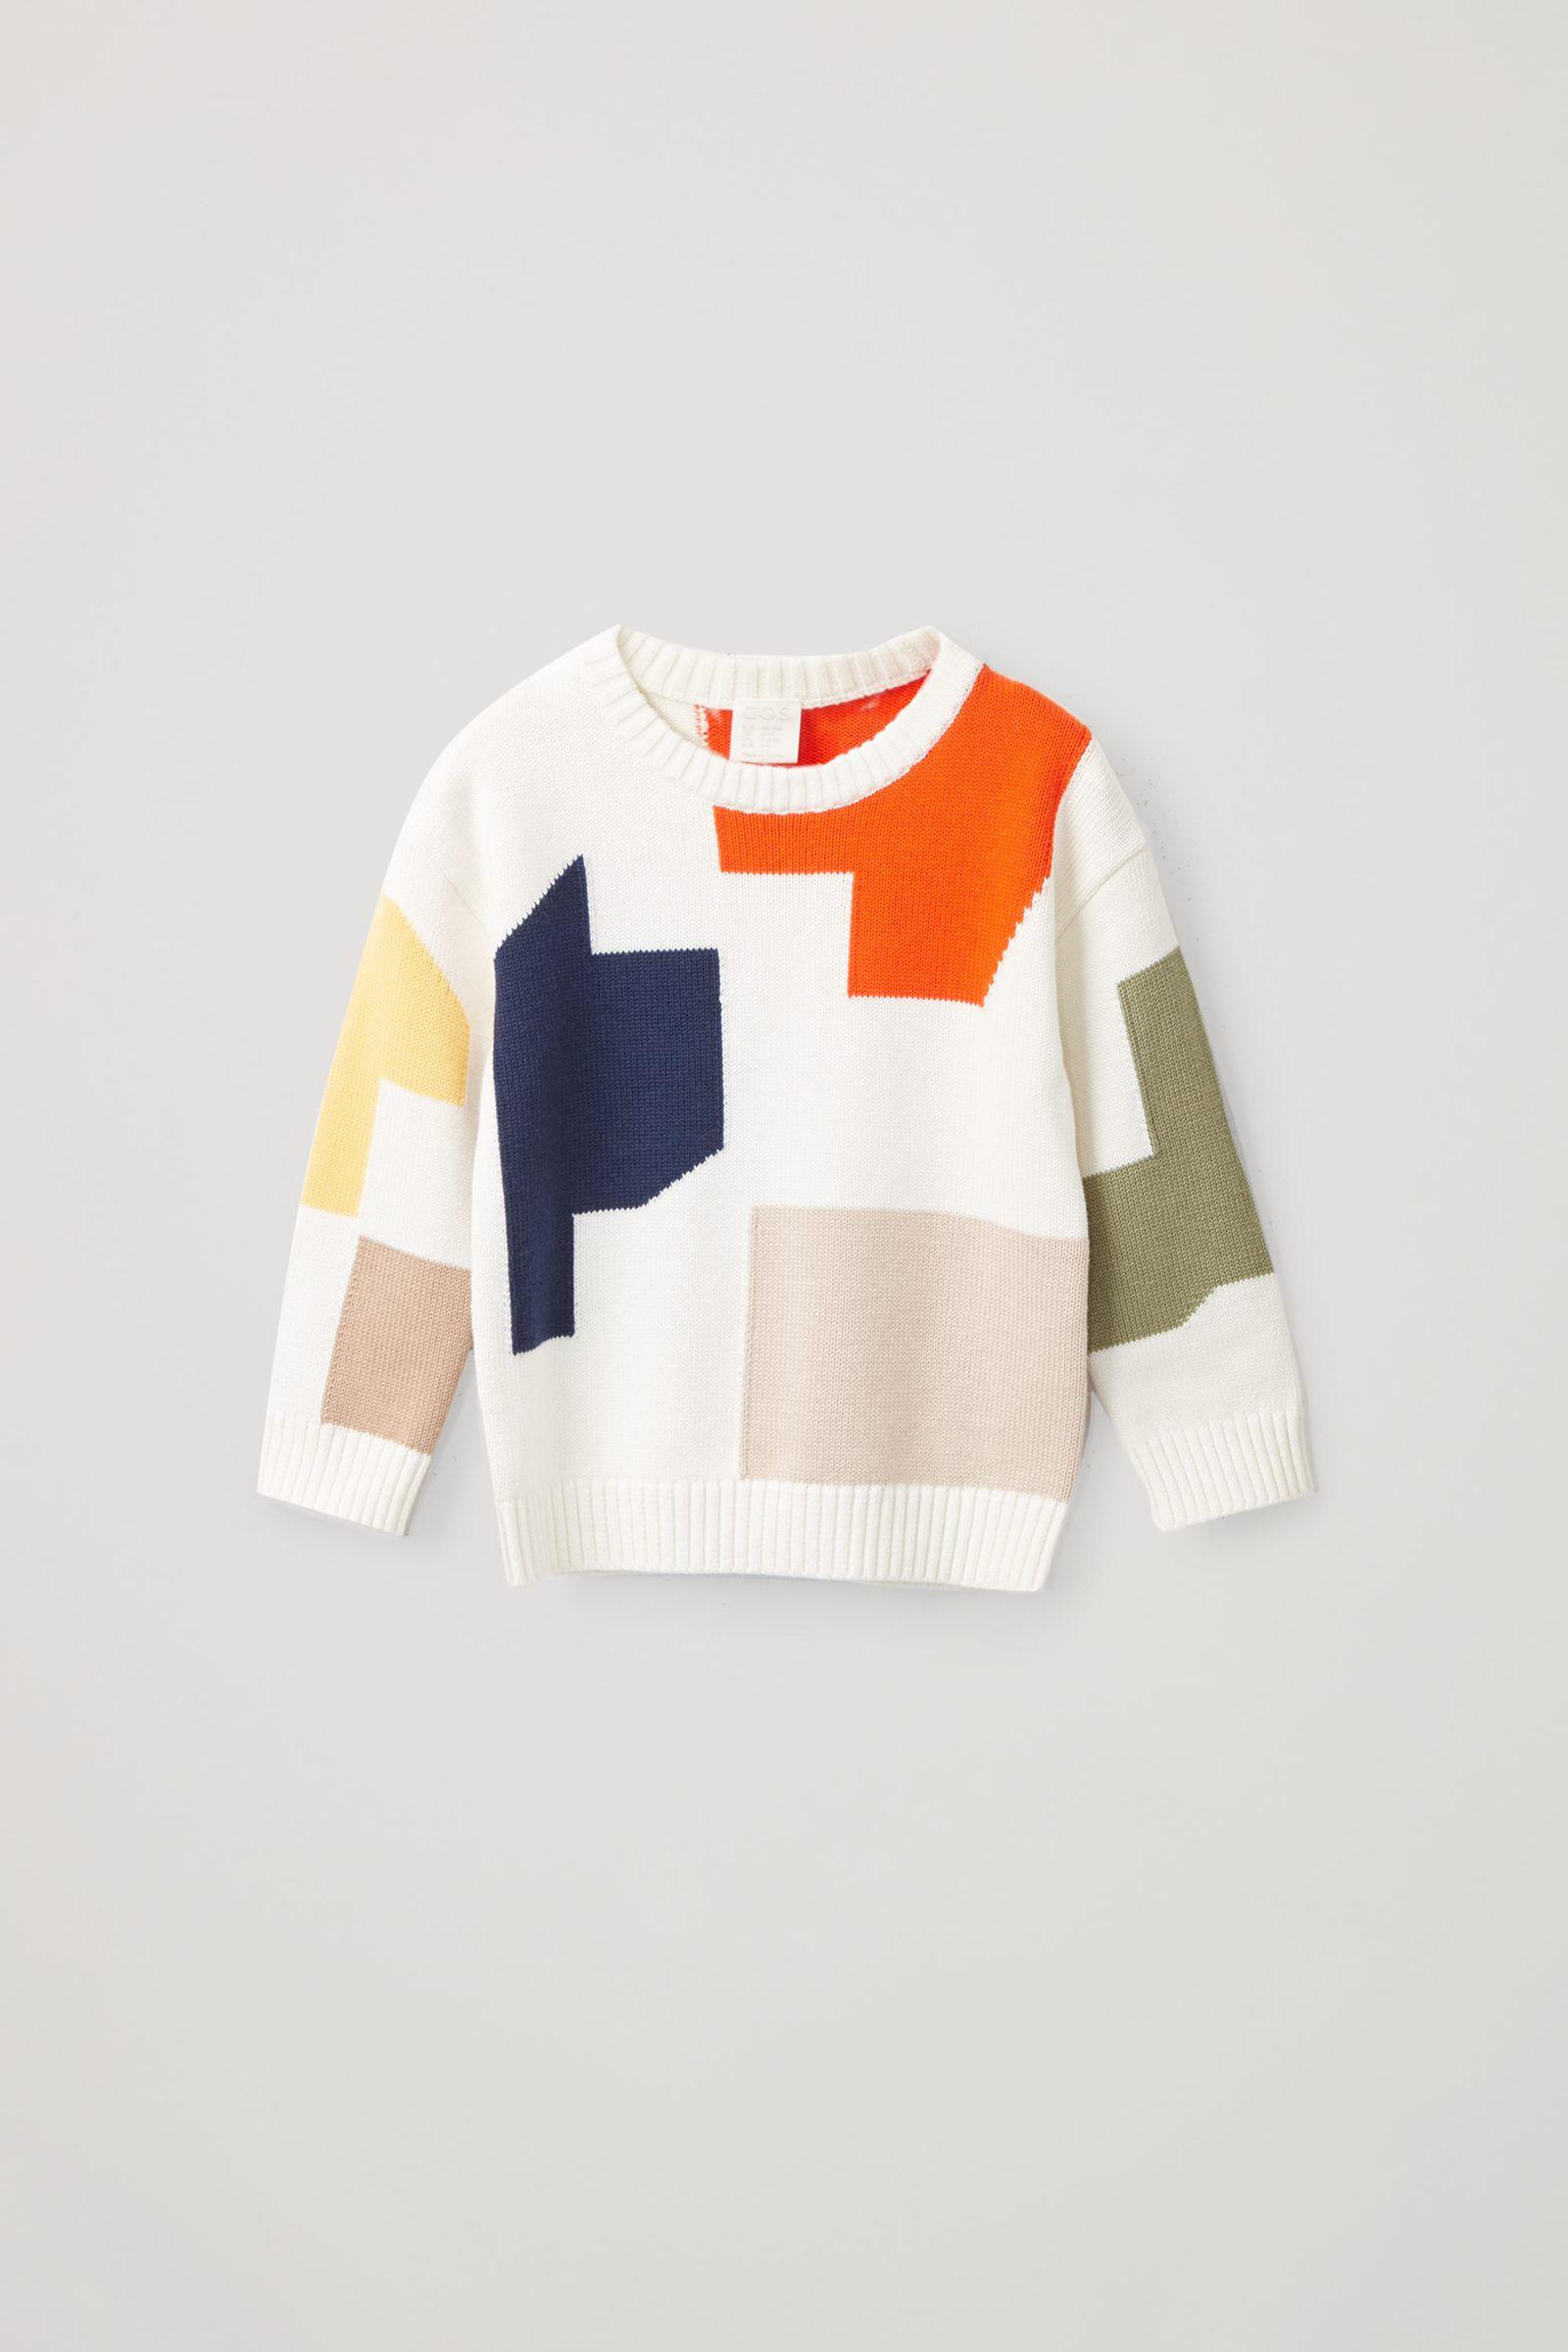 COS 컬러 블록 코튼 울 스웨터의 화이트 / 프린트컬러 Product입니다.